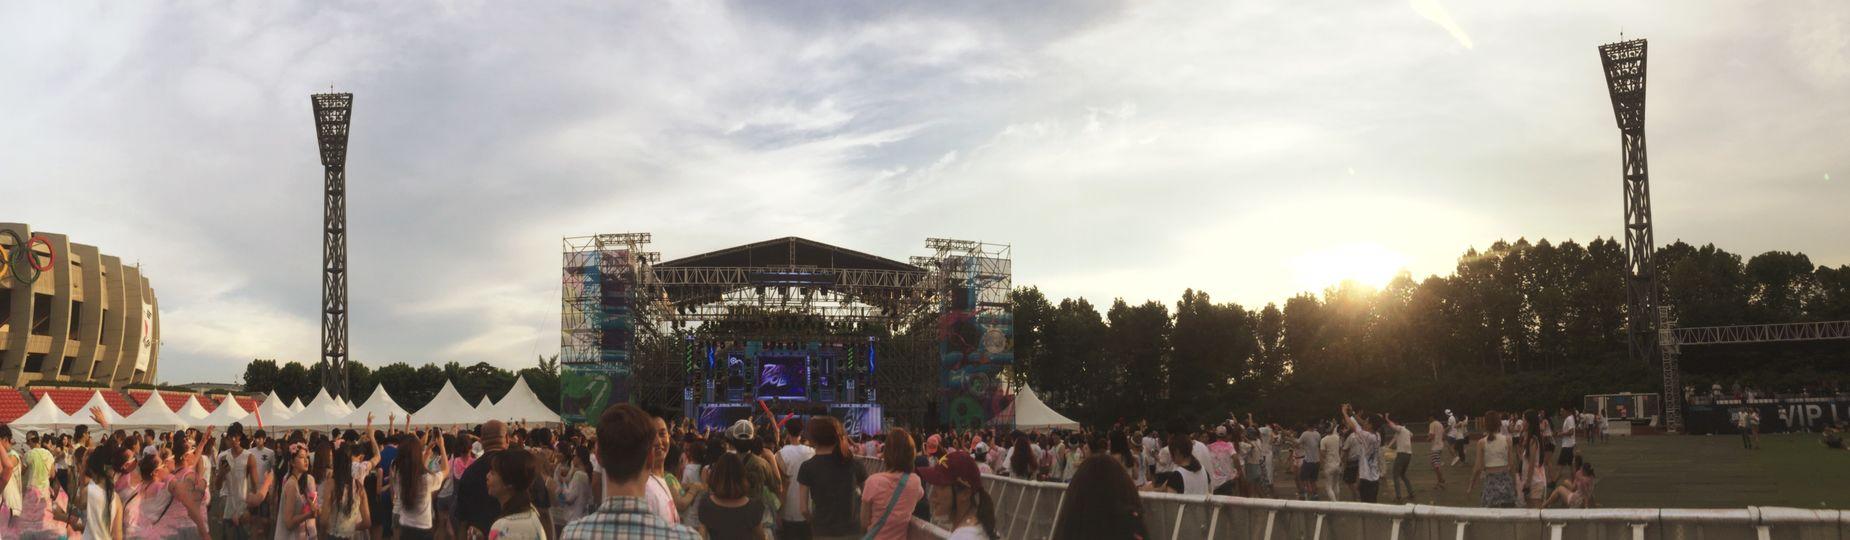 LifeInColor Festival South Korea IPhoneography